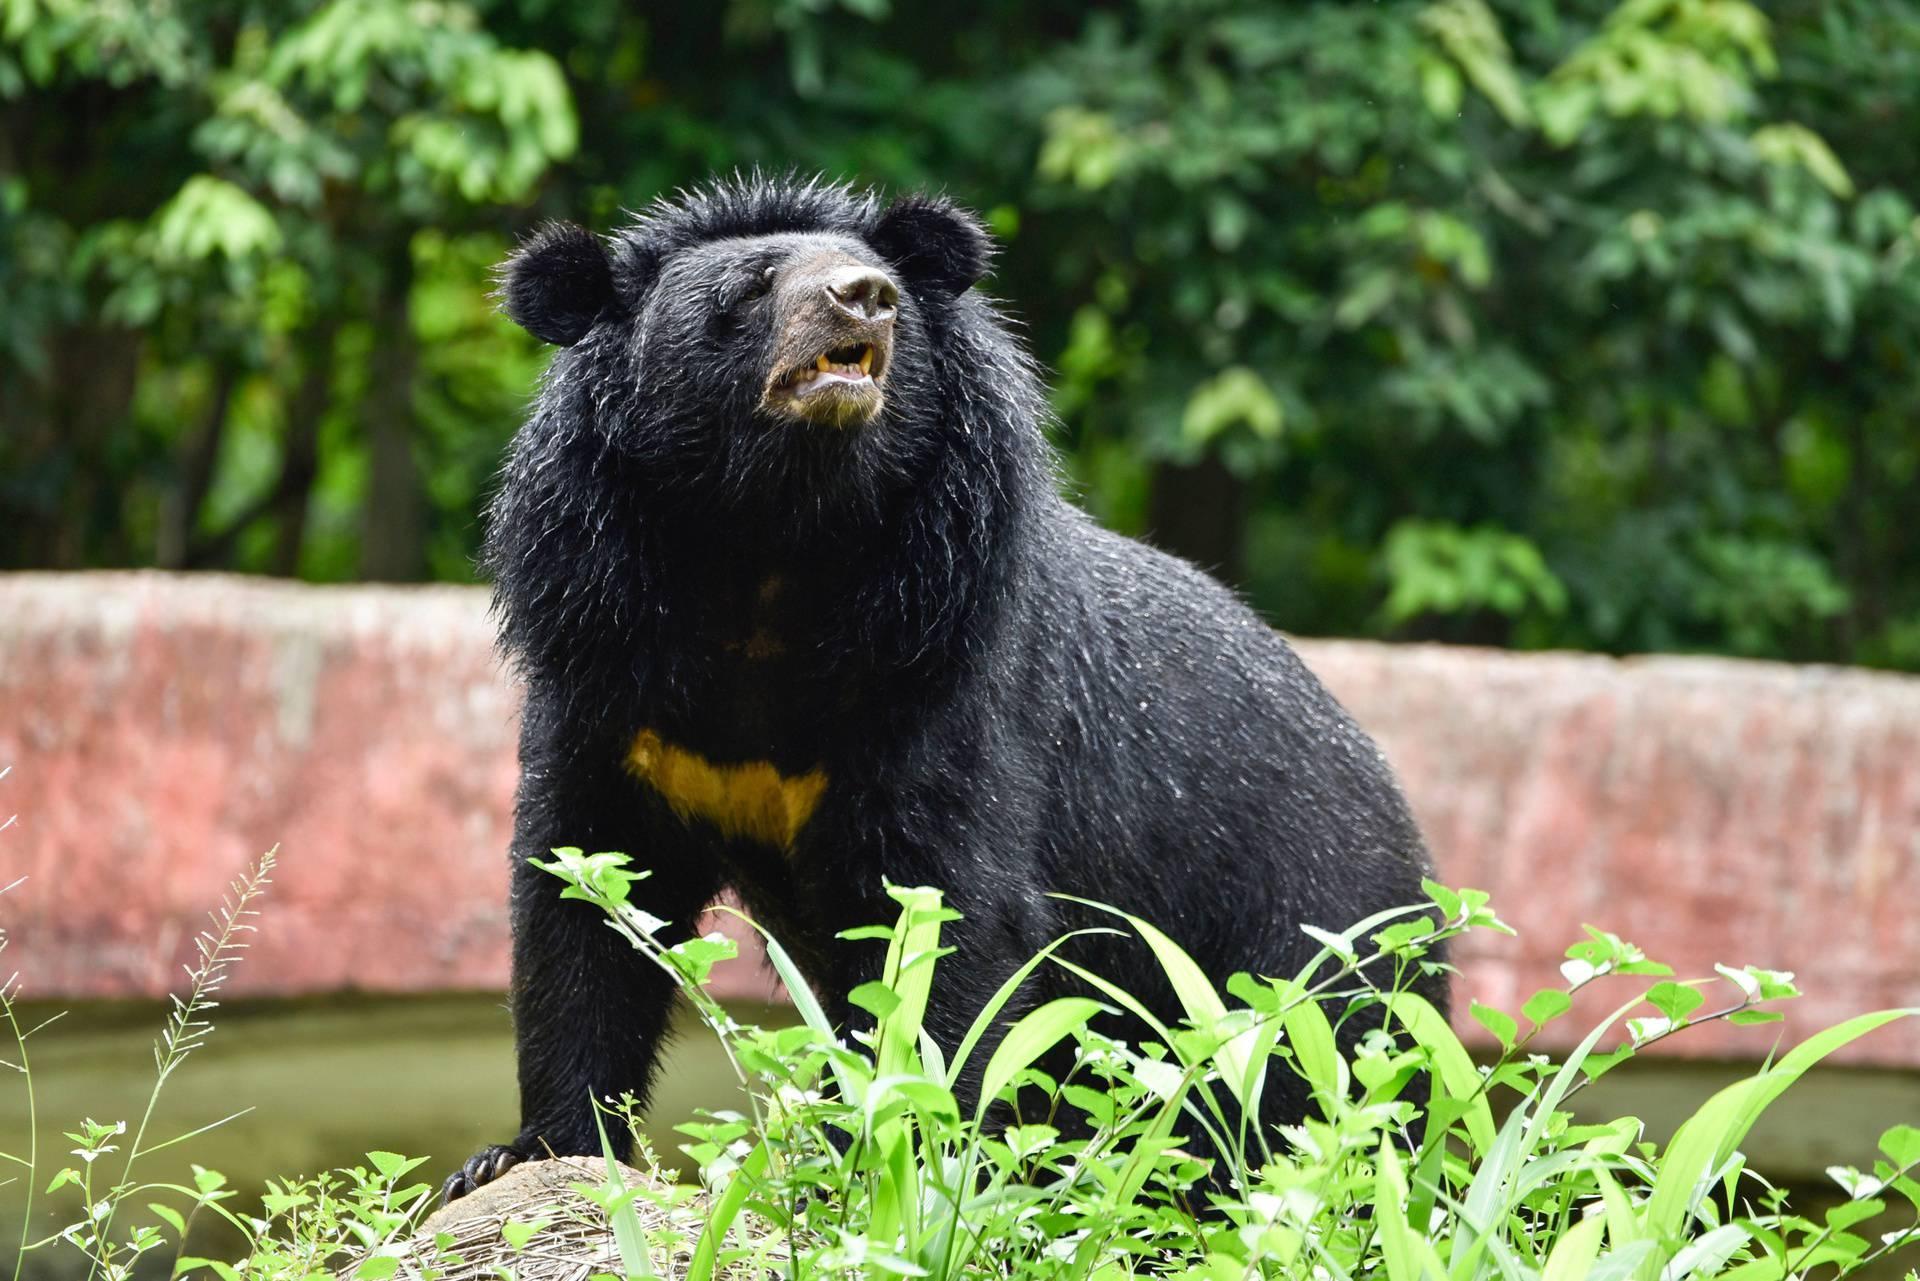 Summer at Assam State Zoo, Guwahati, India - 10 Jun 2019